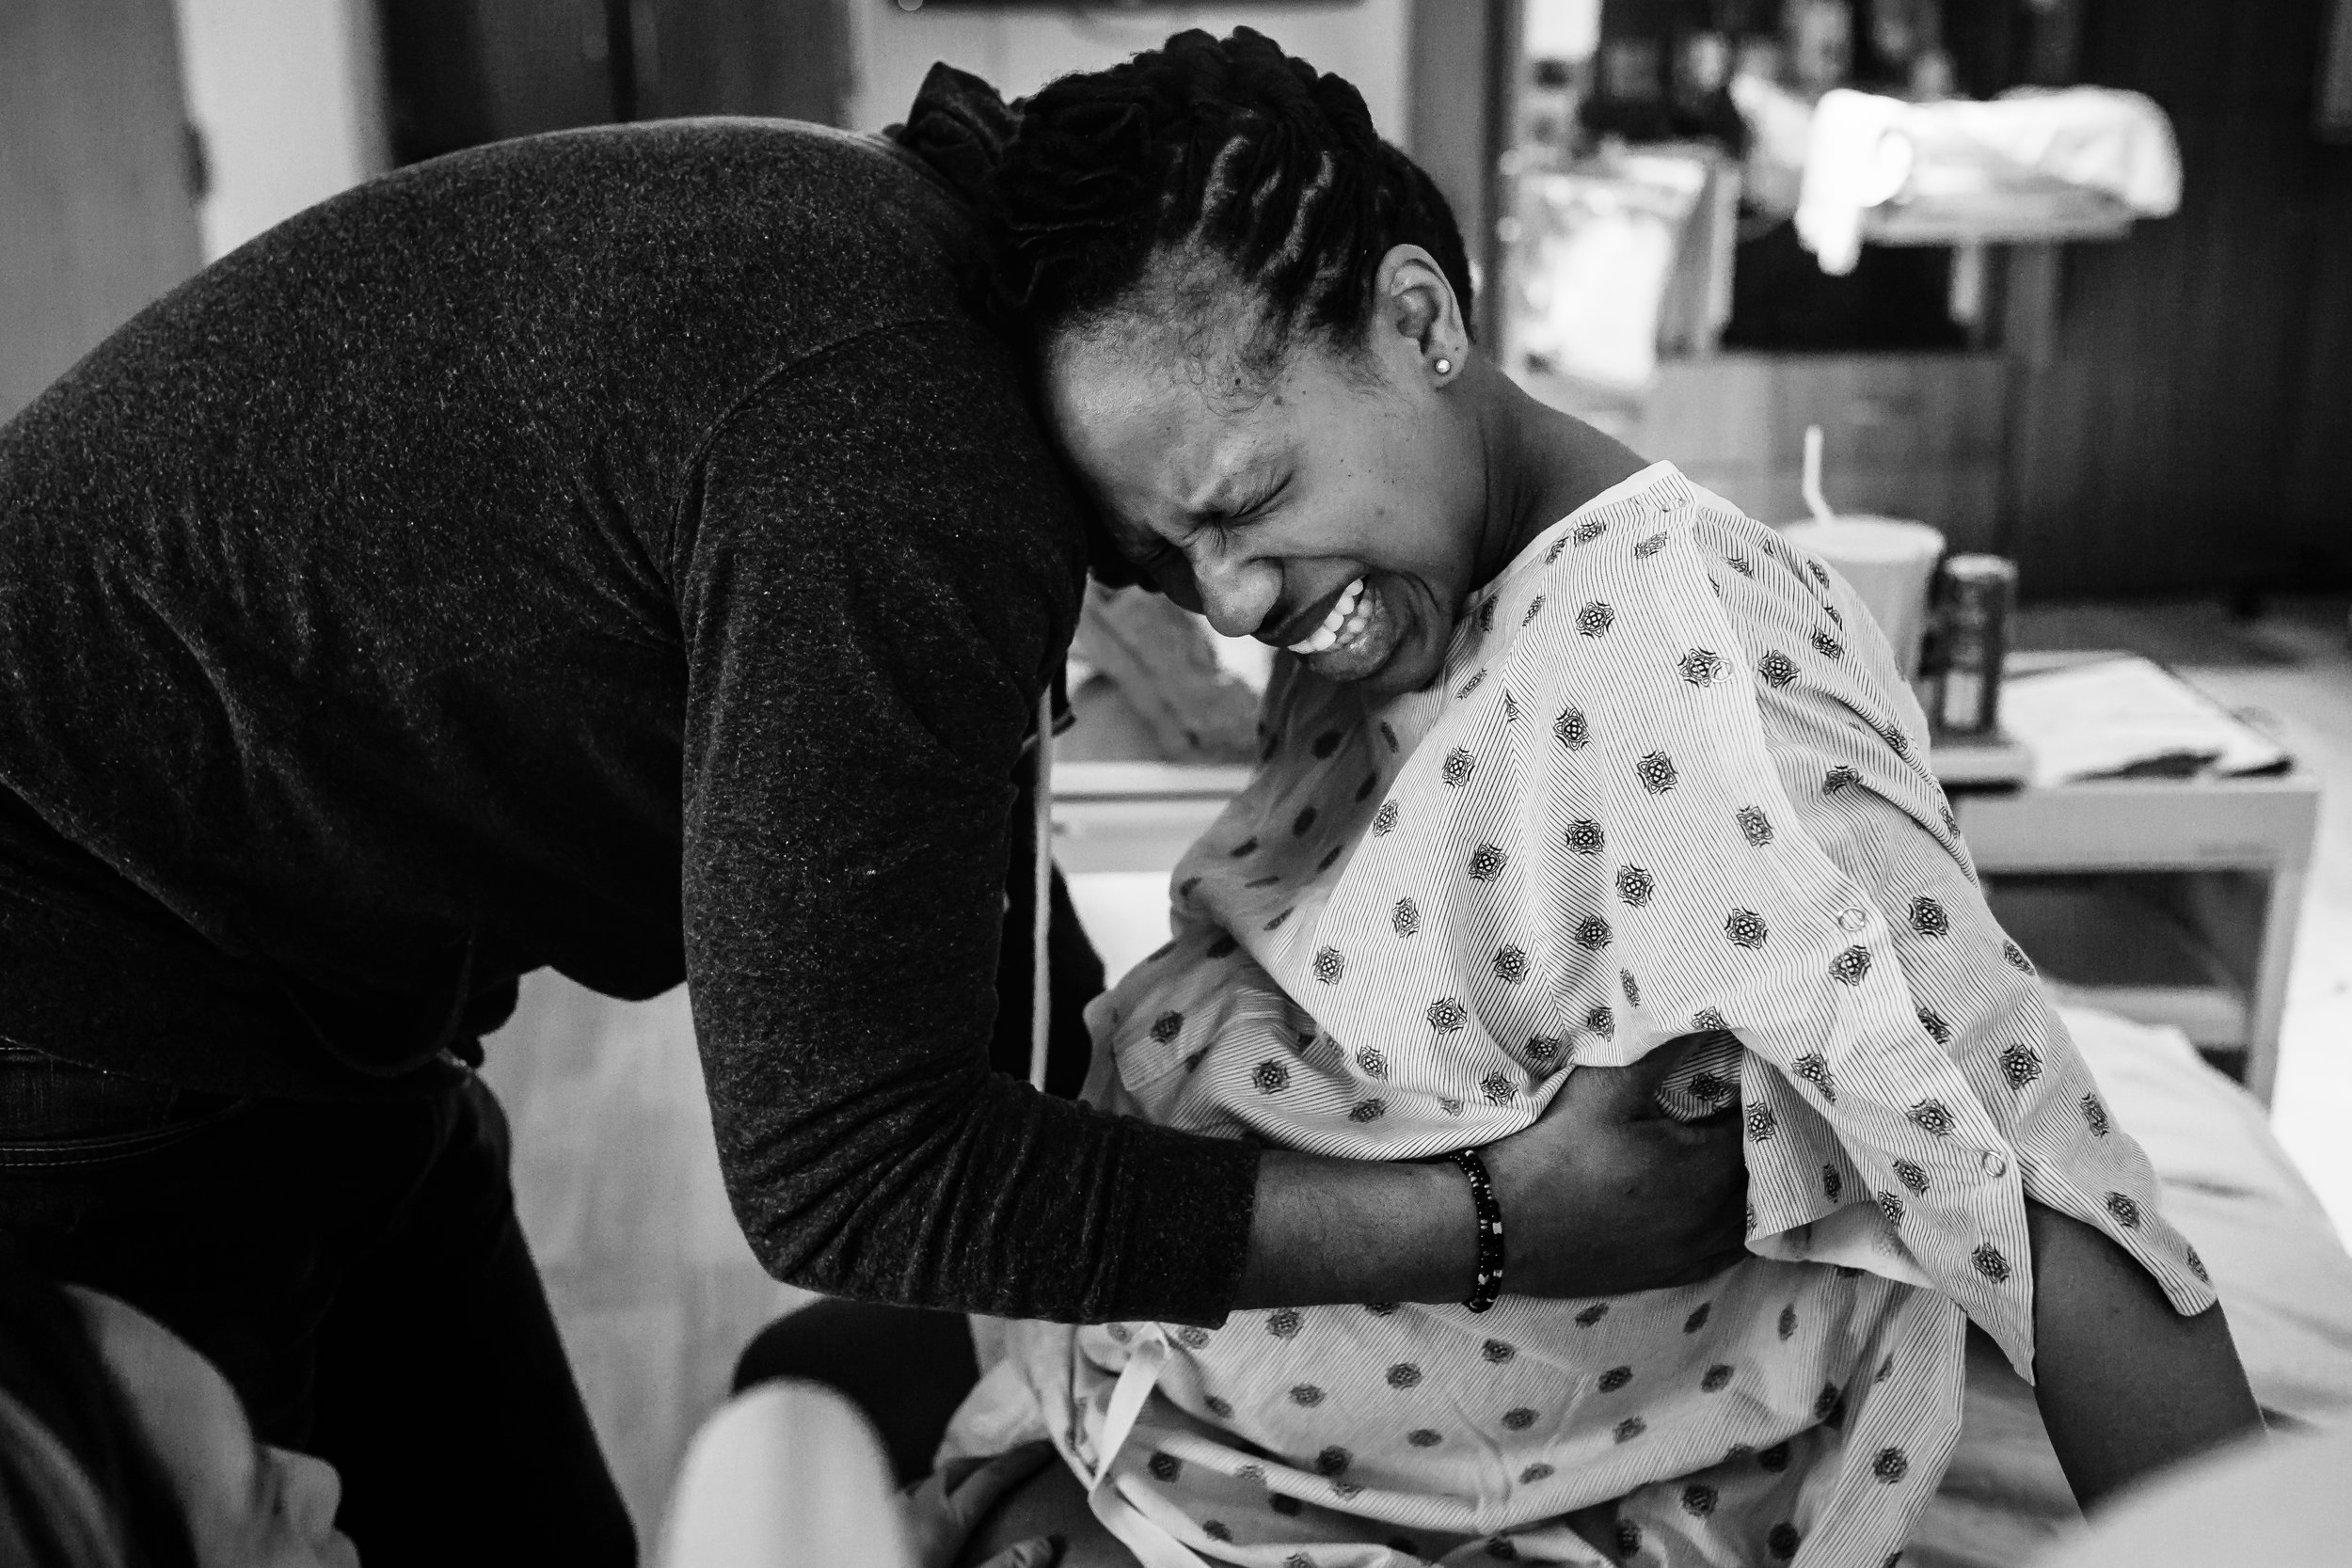 Nadia in labor with Nuri, April 2017.